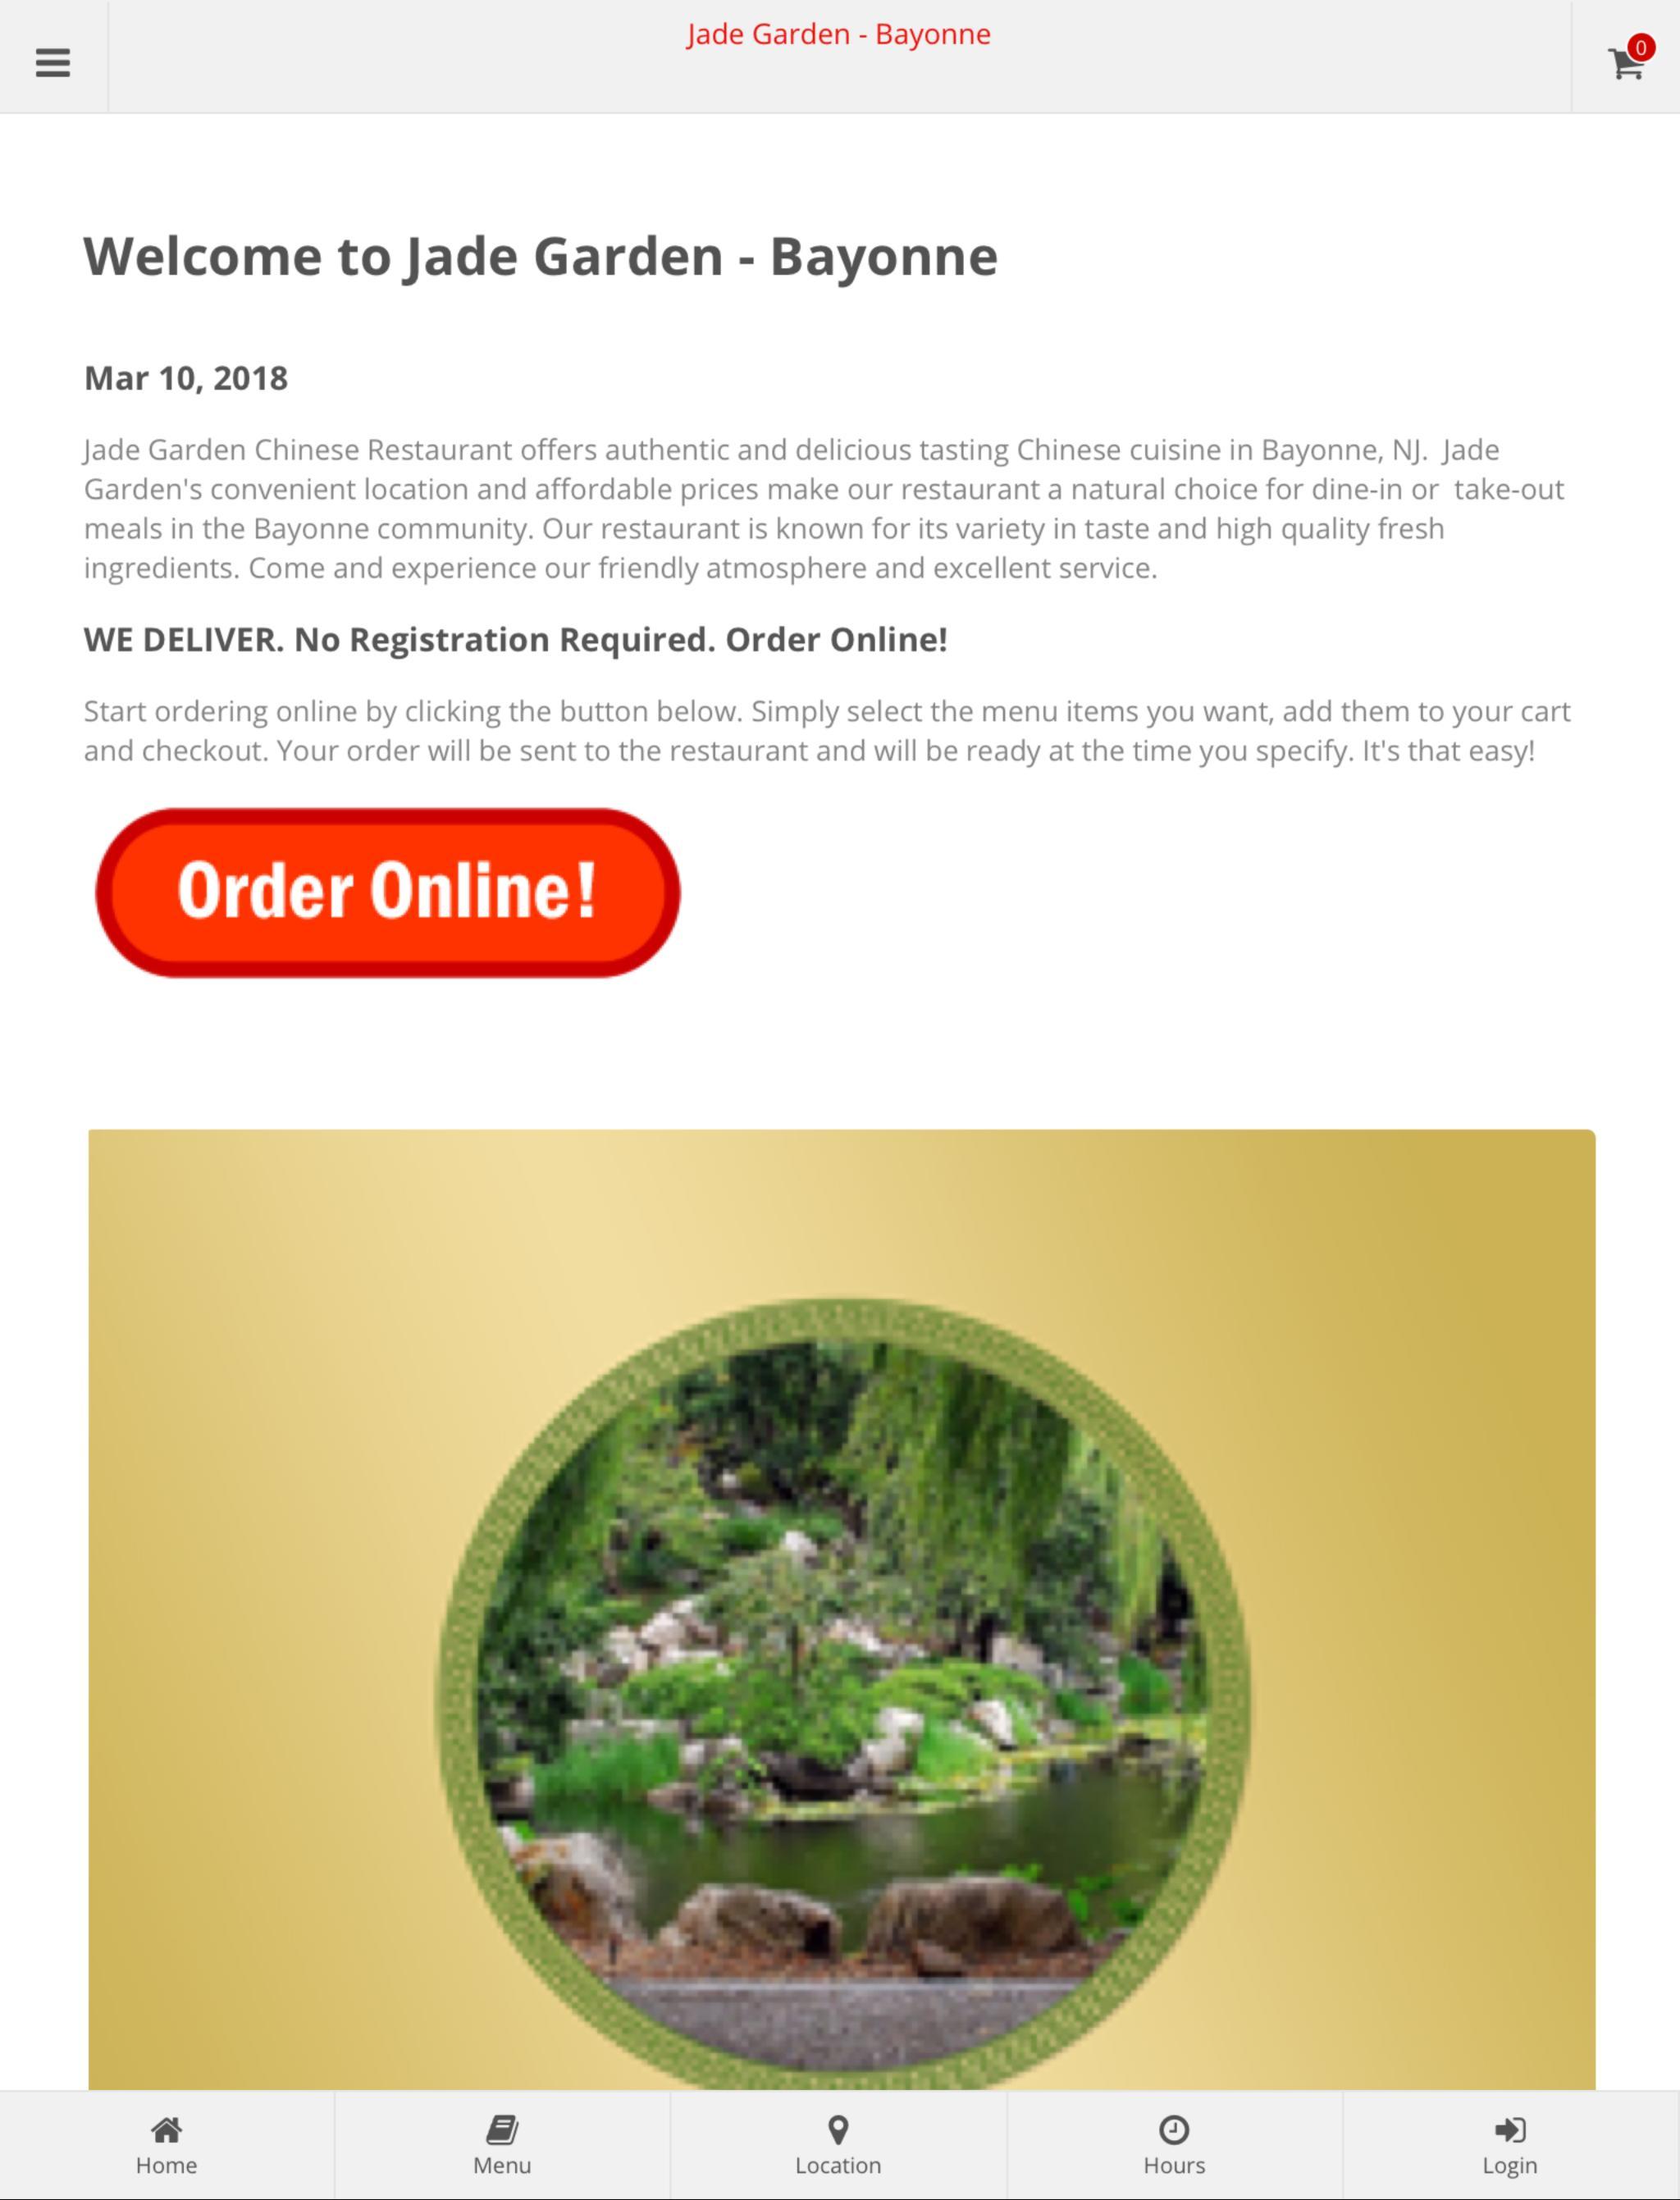 Jade Garden Bayonne Online Ordering For Android Apk Download